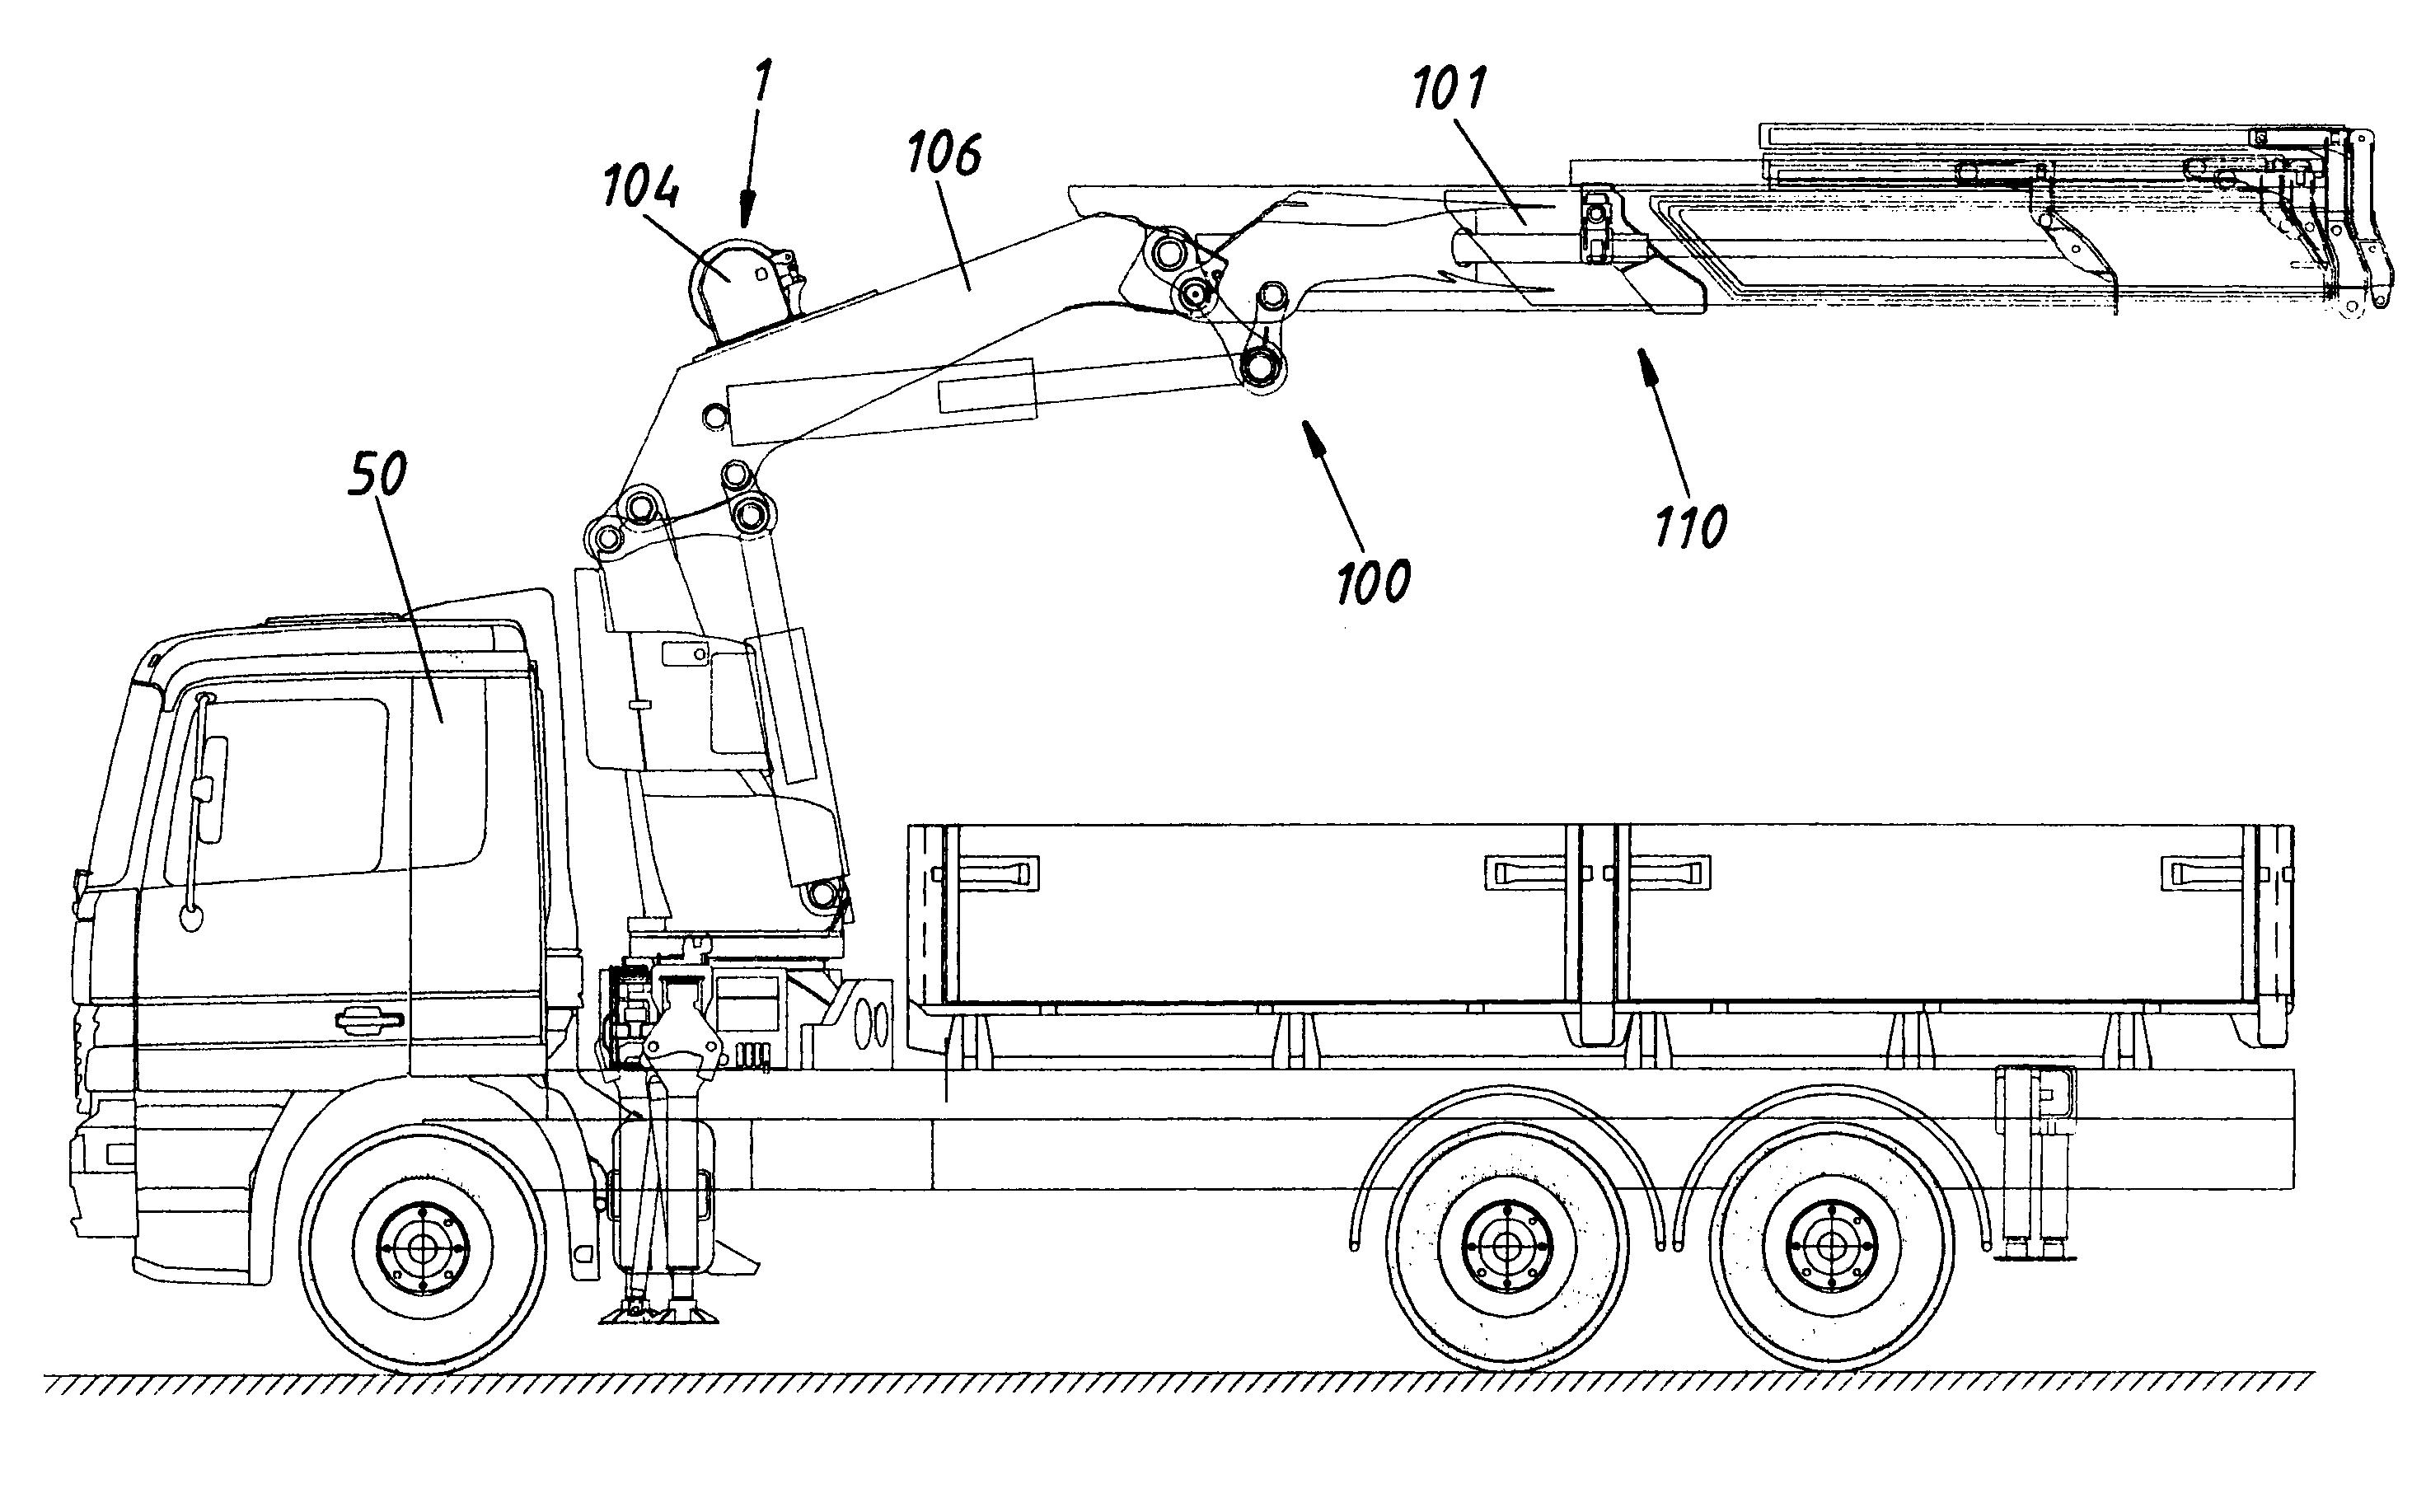 US20130092648A1 20130418 D00000 patent us20130092648 vehicle crane google patents palfinger crane wiring diagram at edmiracle.co